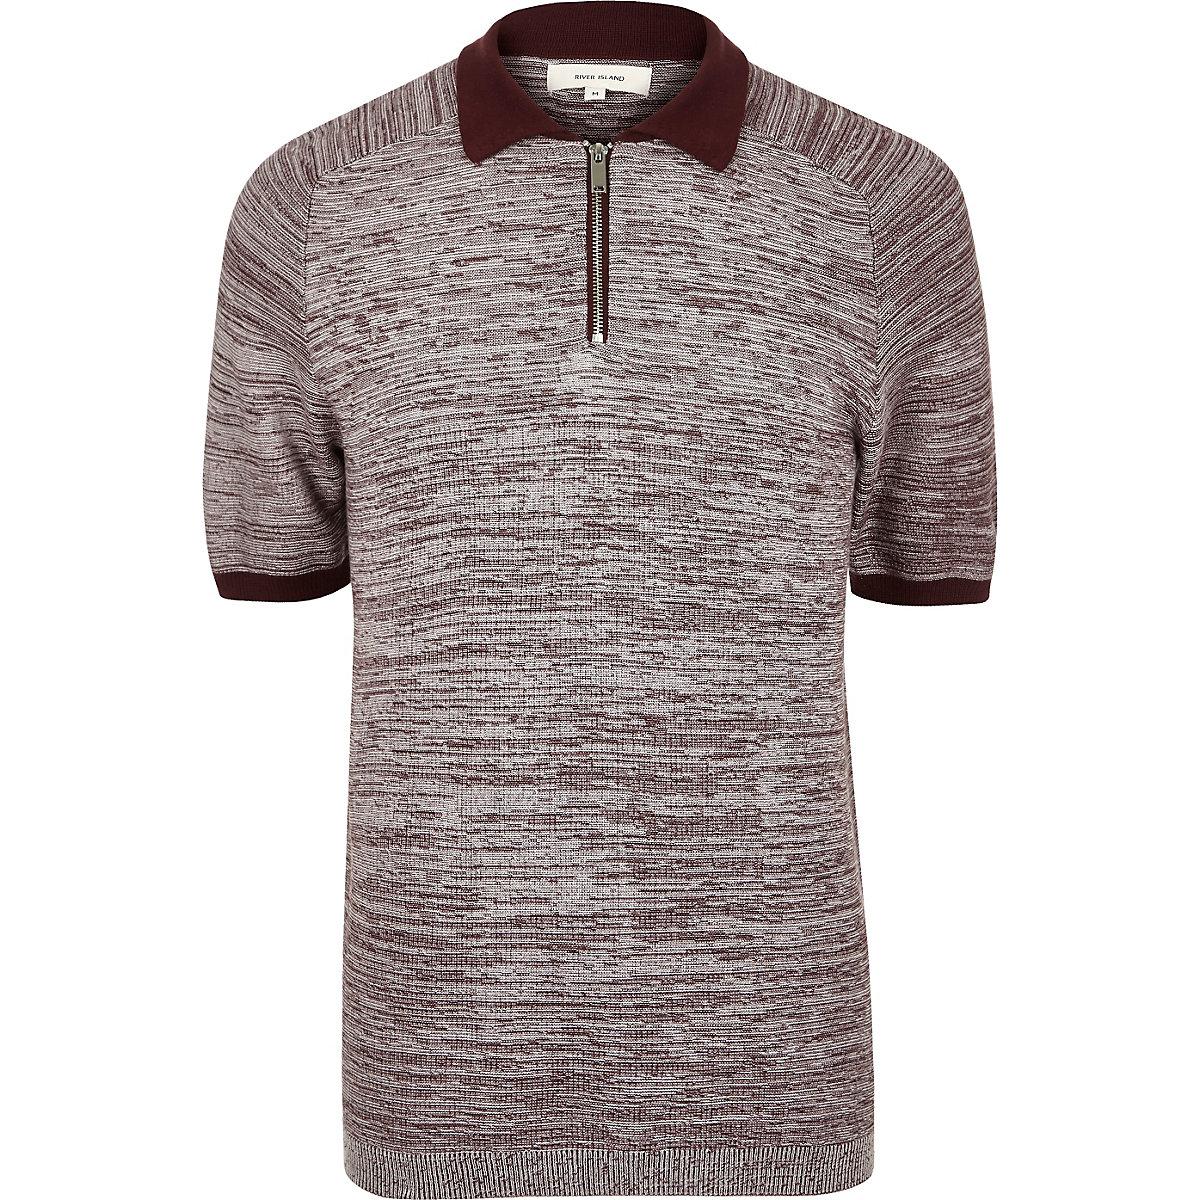 Burgundy textured zip-up polo shirt